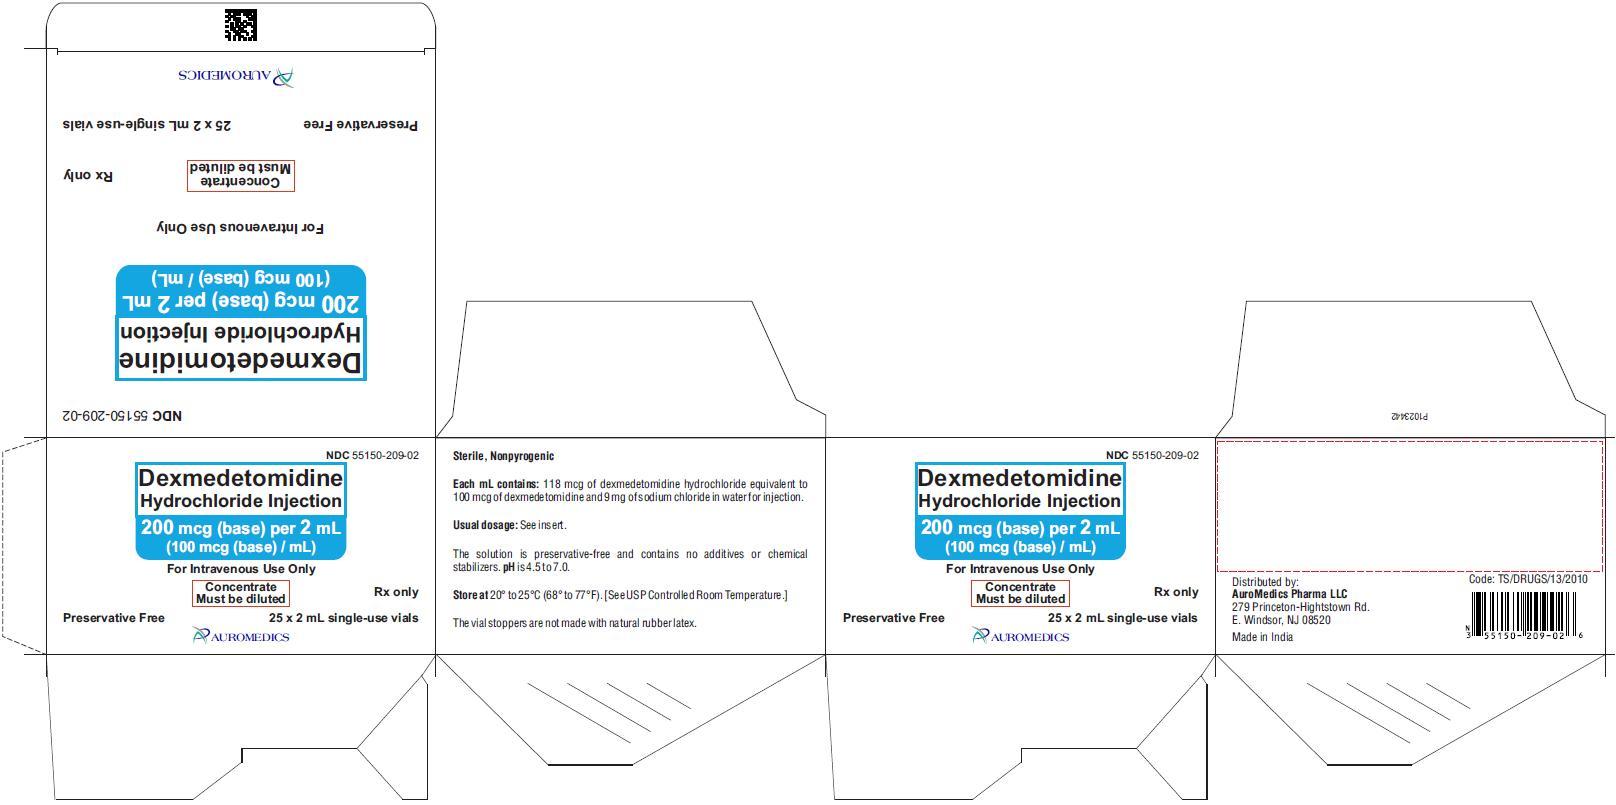 PACKAGE LABEL-PRINCIPAL DISPLAY PANEL - 200 mcg (base) per 2 mL (100 mcg (base) / mL) - Container-Carton (25 Vials)